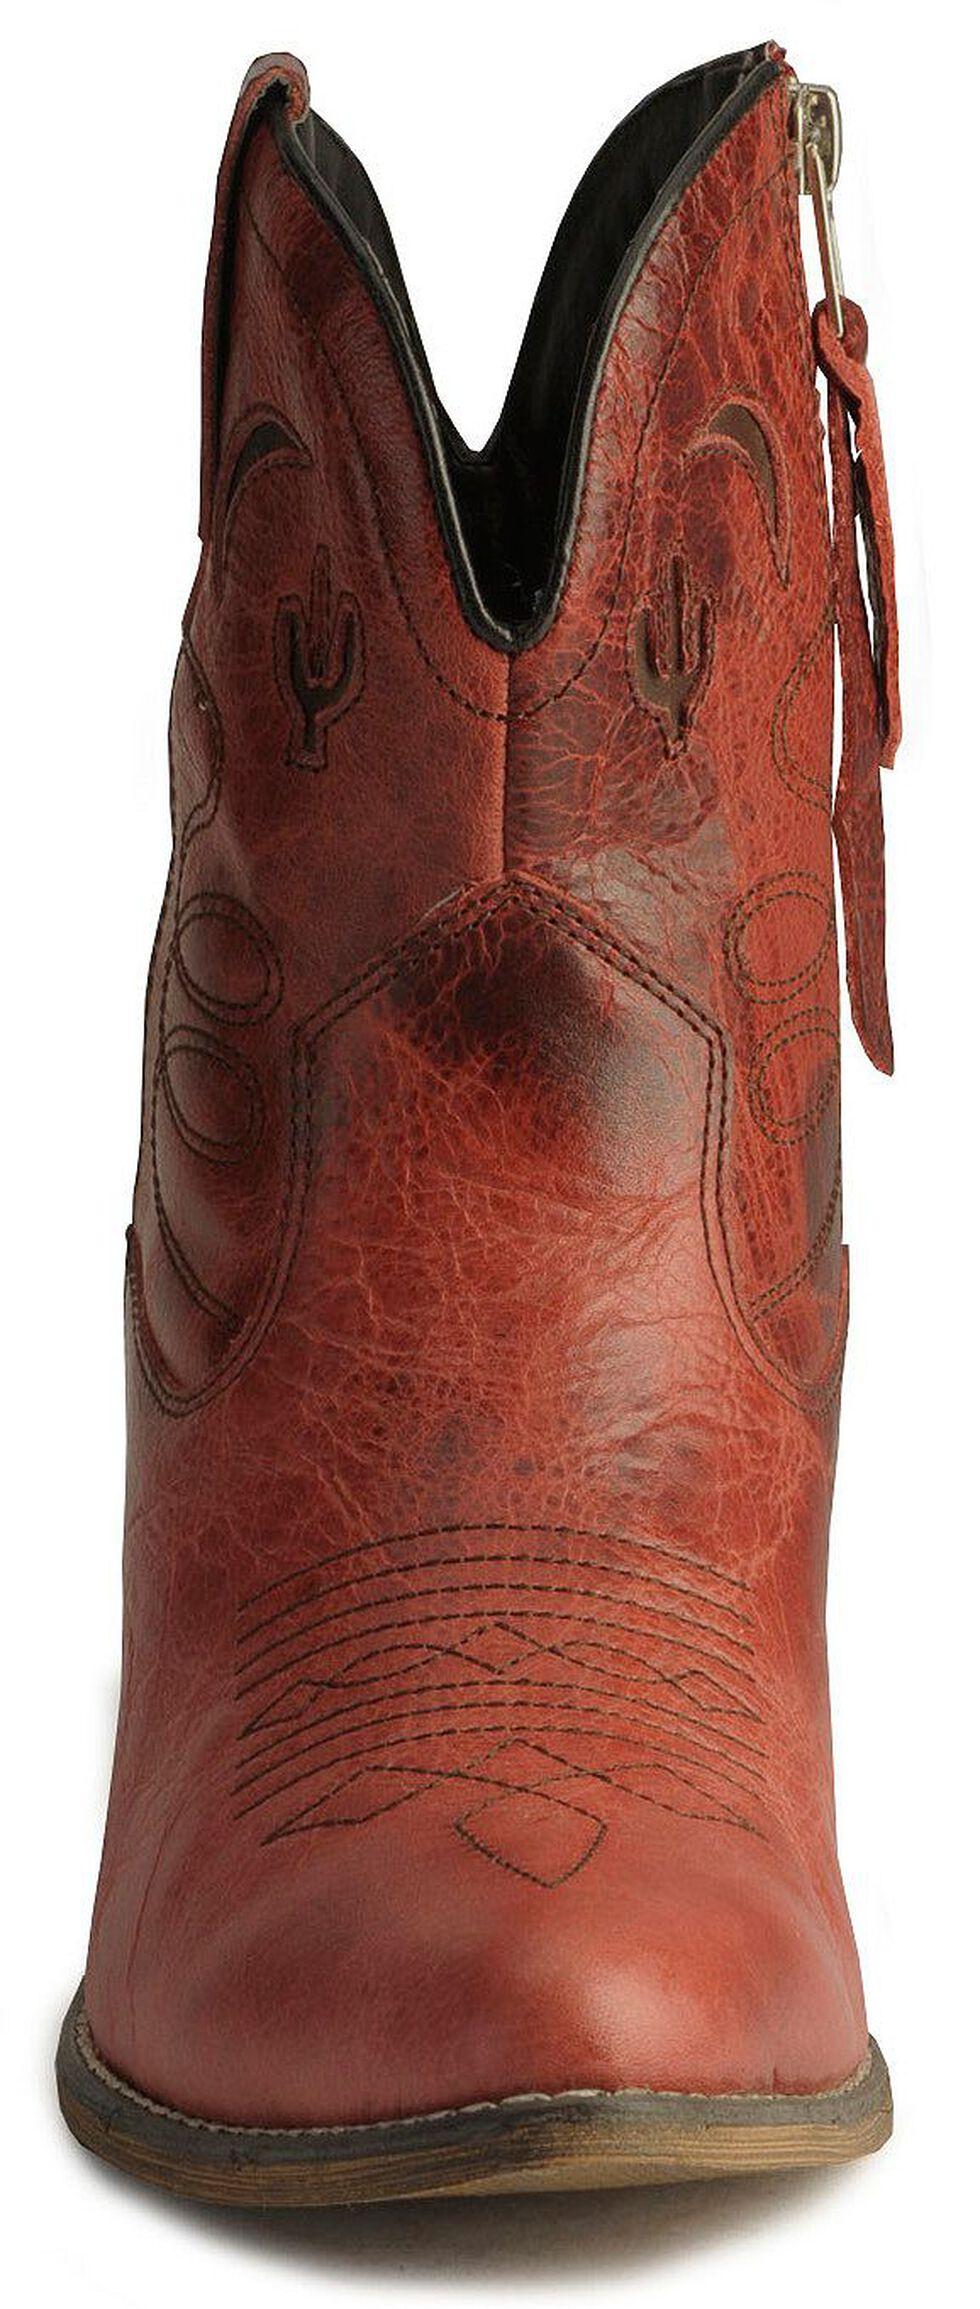 Dingo Moon & Cactus Zipper Ankle Boots, Red, hi-res